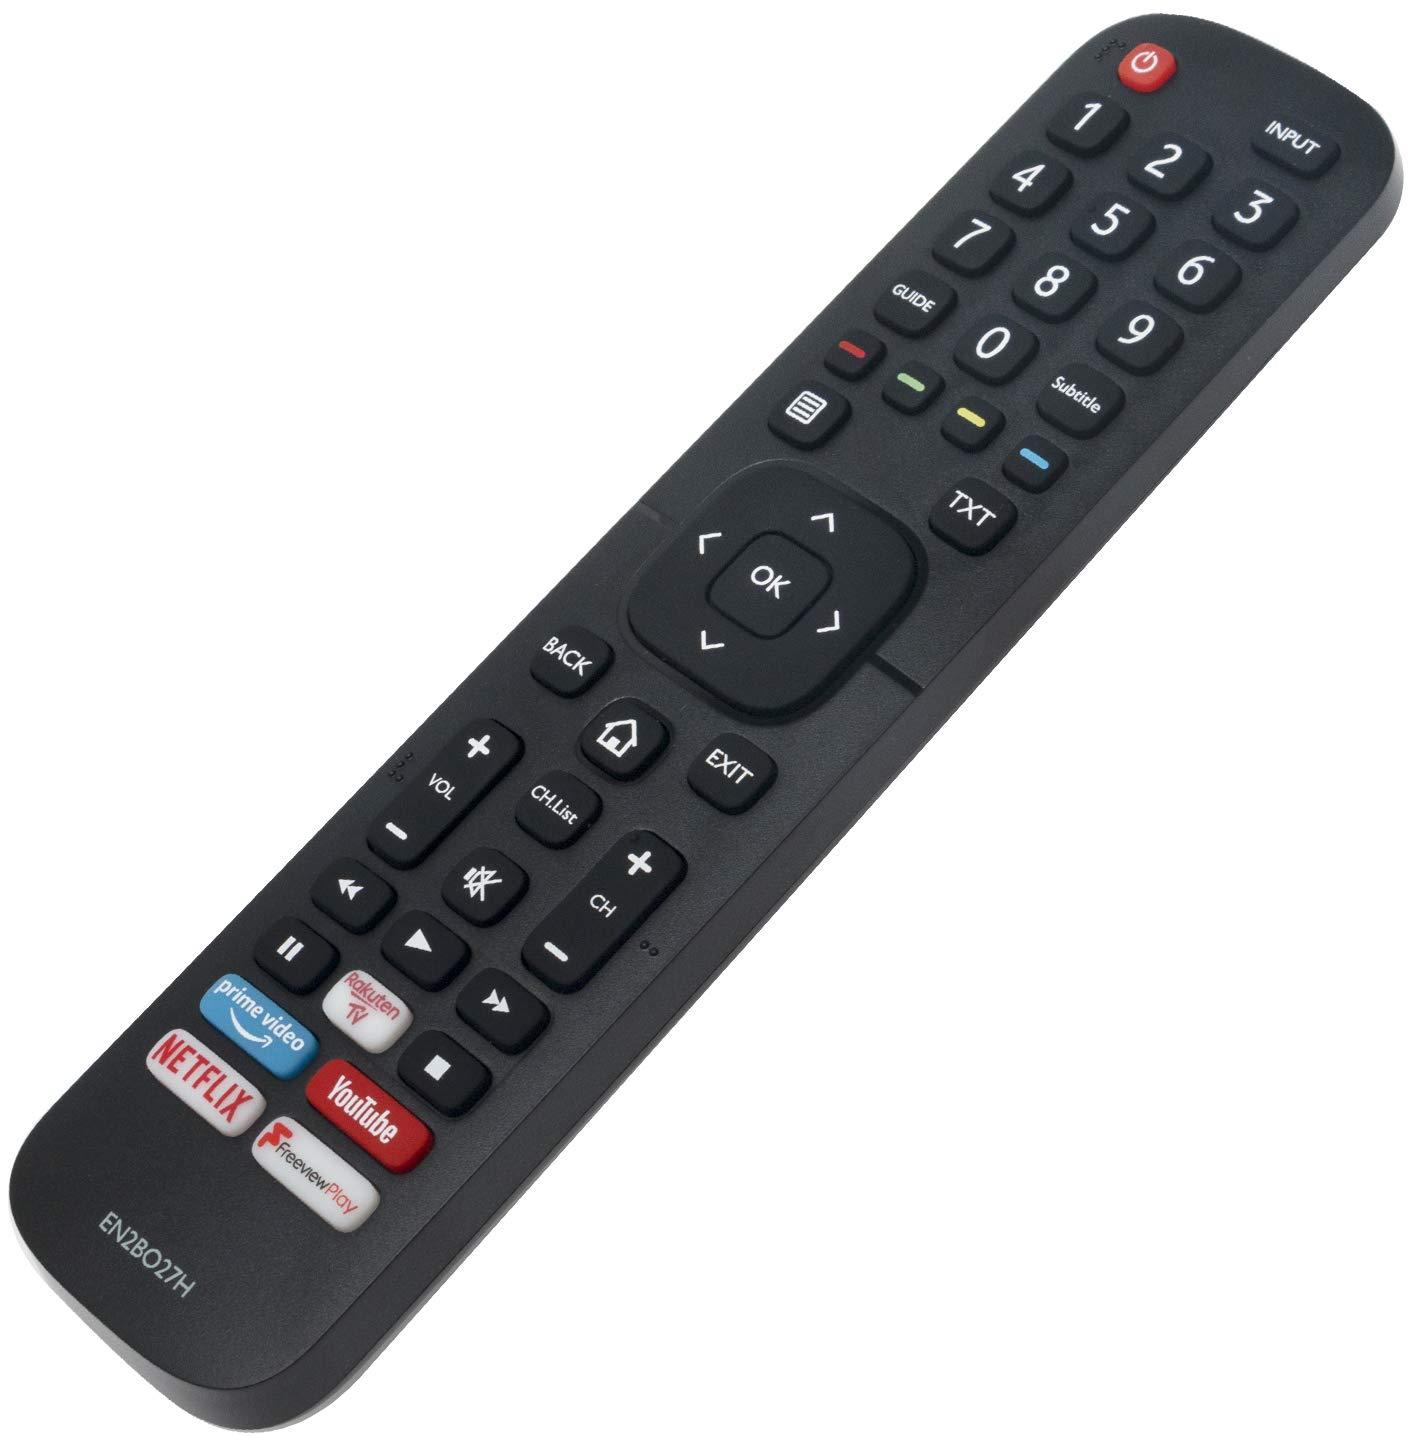 ALLIMITY EN2BO27H Mando a Distancia reemplazado por Hisense UHD 4K TV with Netflix F-Play RauktenTV Button H50B7510 H55B7100 H55B7300 H55B7500 H55B7510 H65B7100 H65B7300 H65B7500 H65B7510: Amazon.es: Electrónica